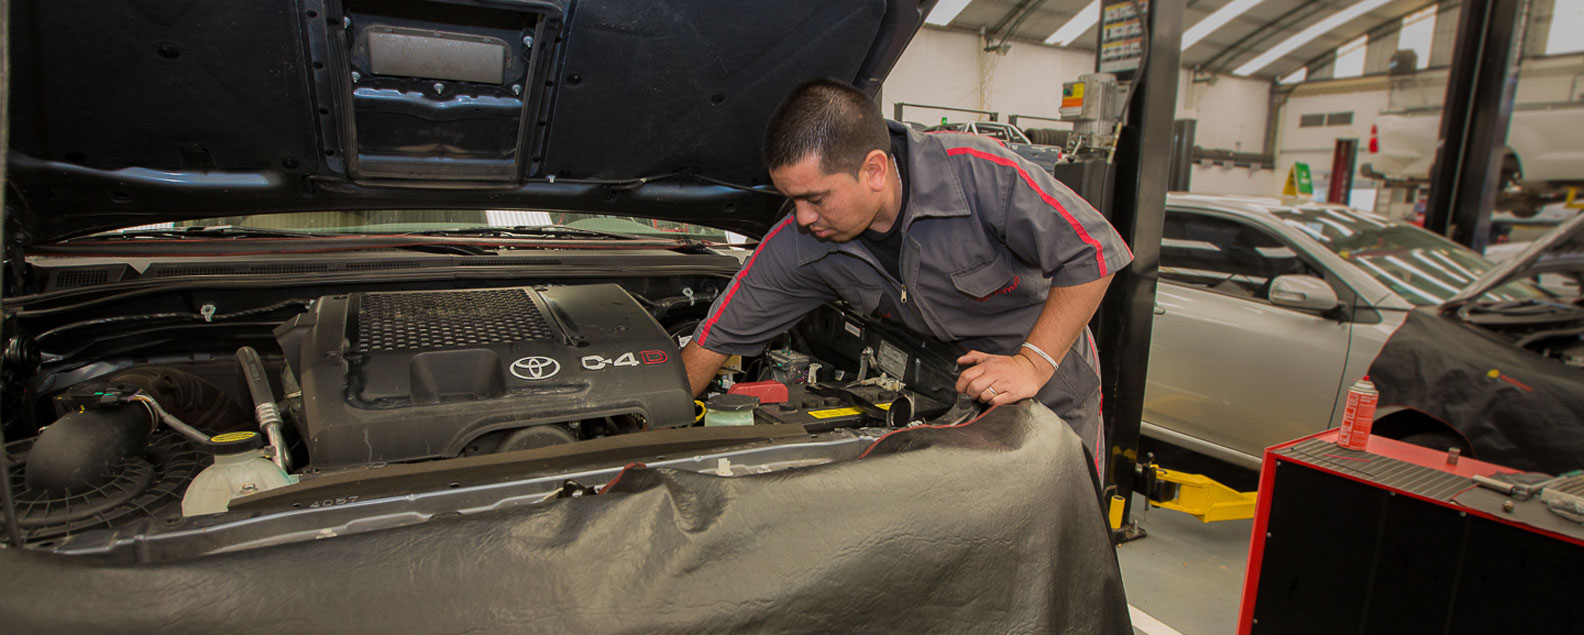 Toyota Sarthou Servicio Postventa